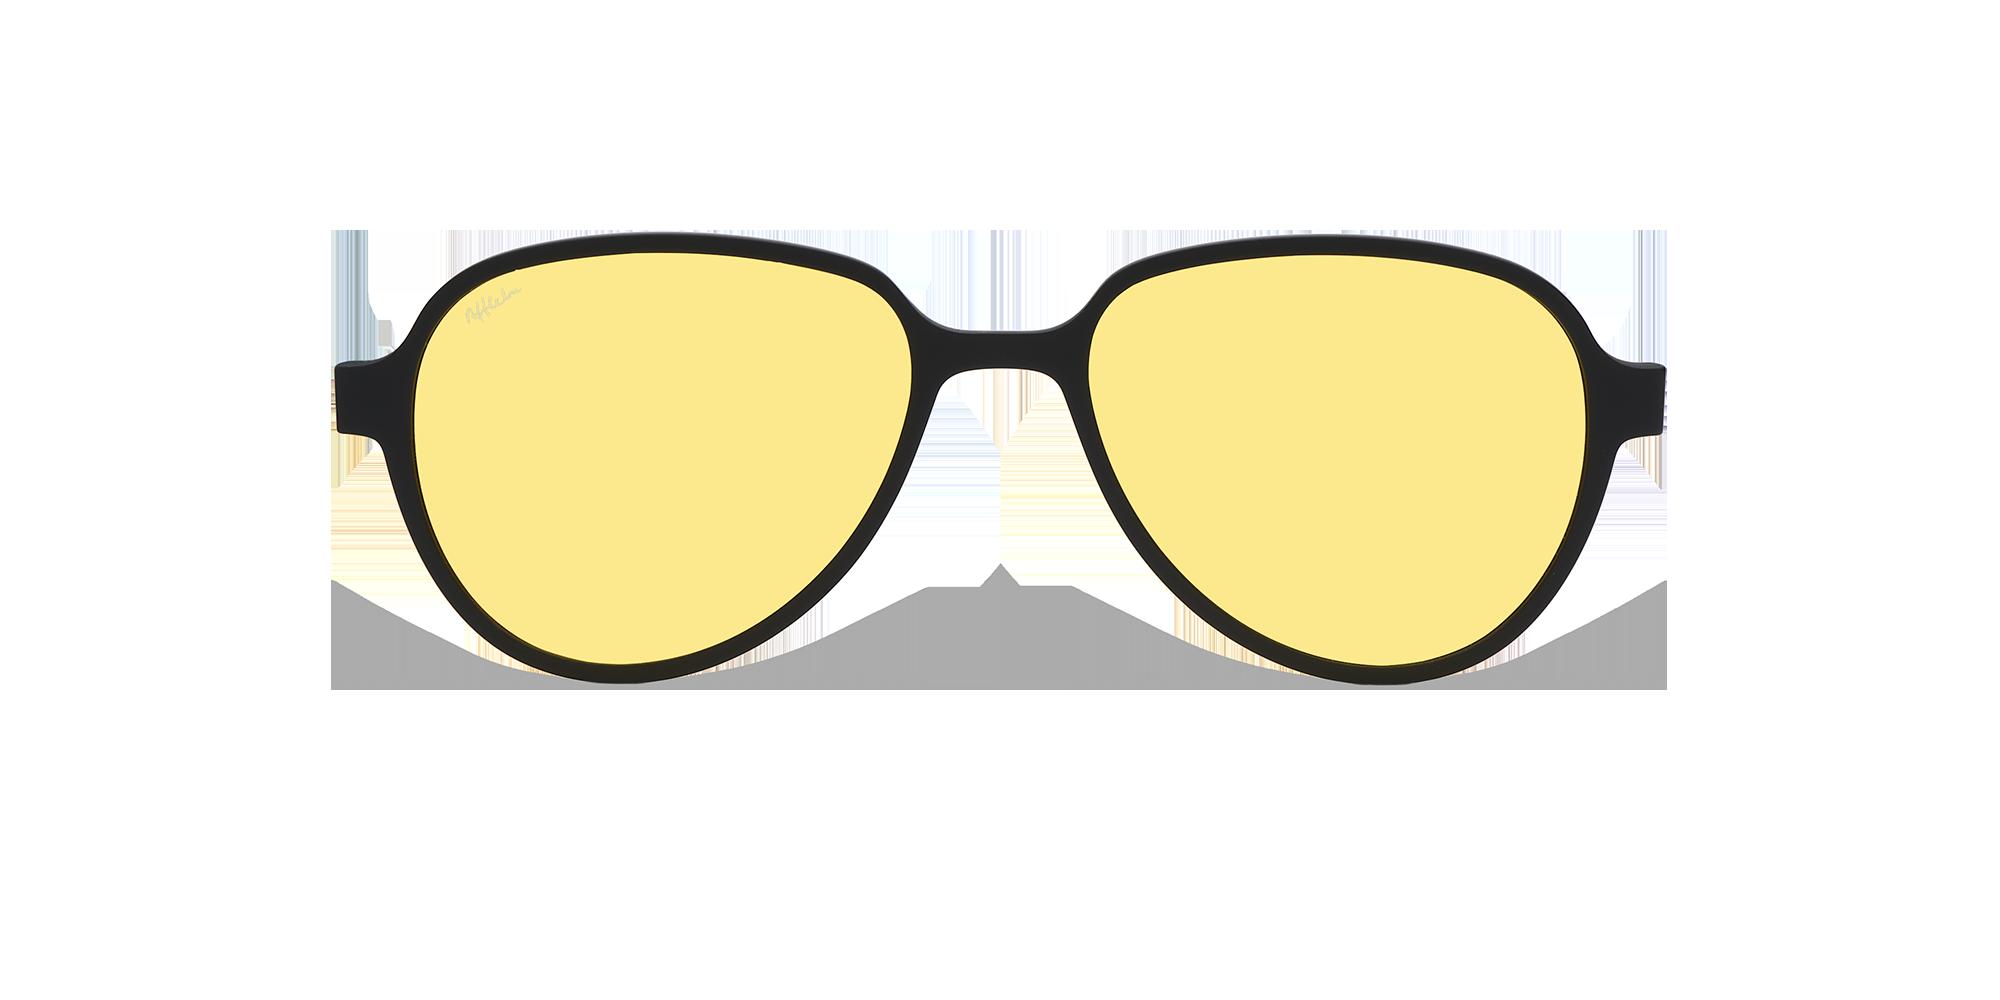 afflelou/france/products/smart_clip/clips_glasses/TMK43YEBK015417.png